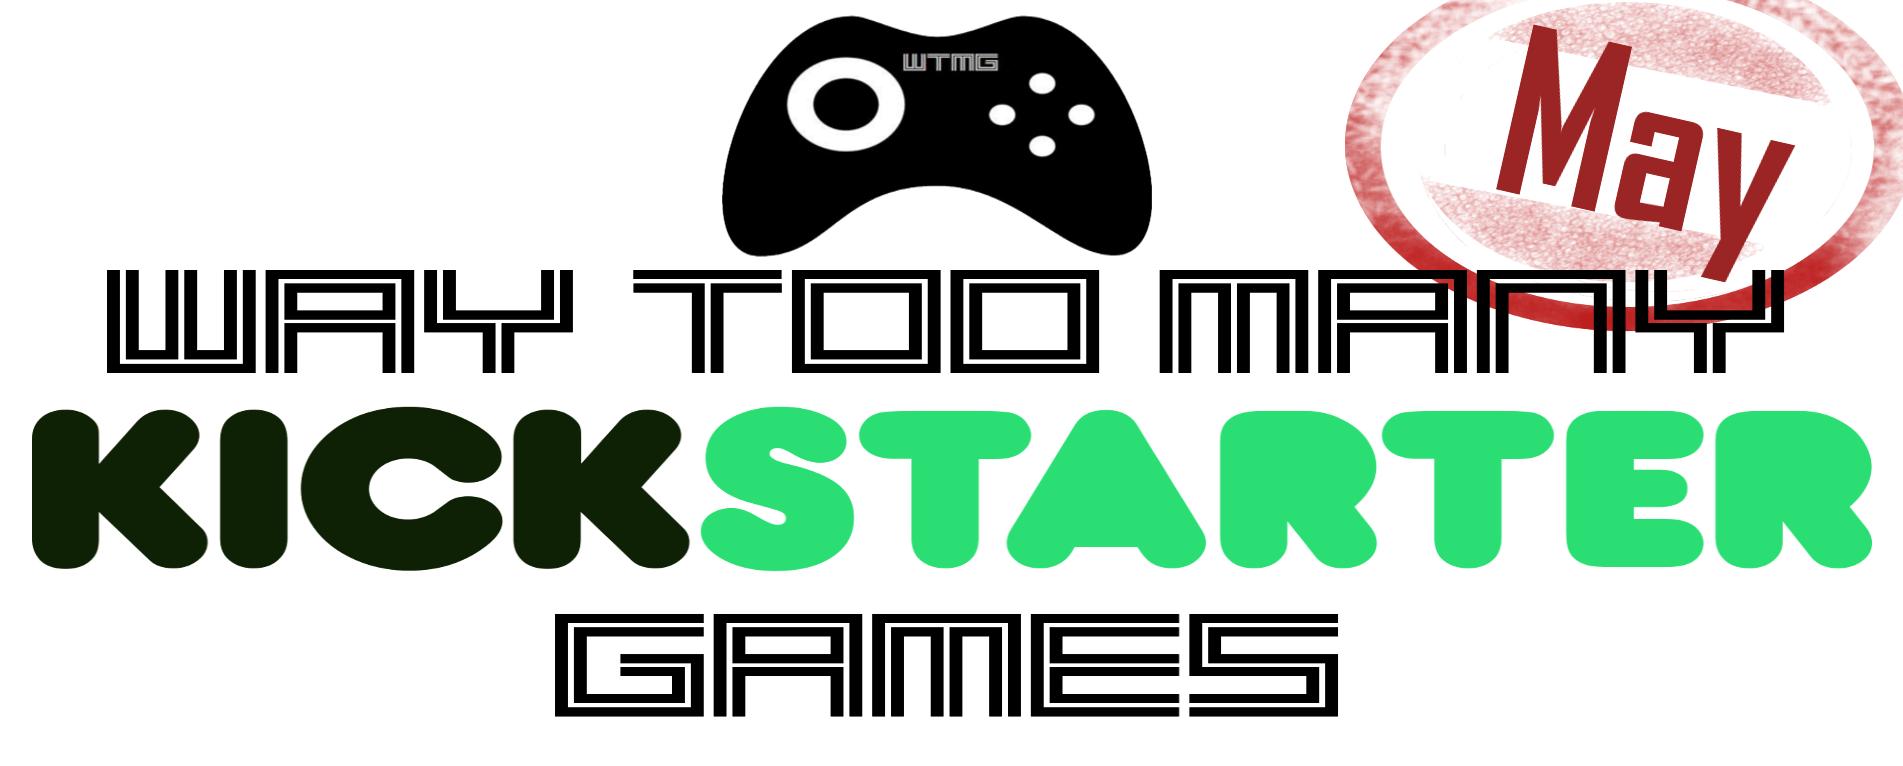 Kickstarter Roundup - May